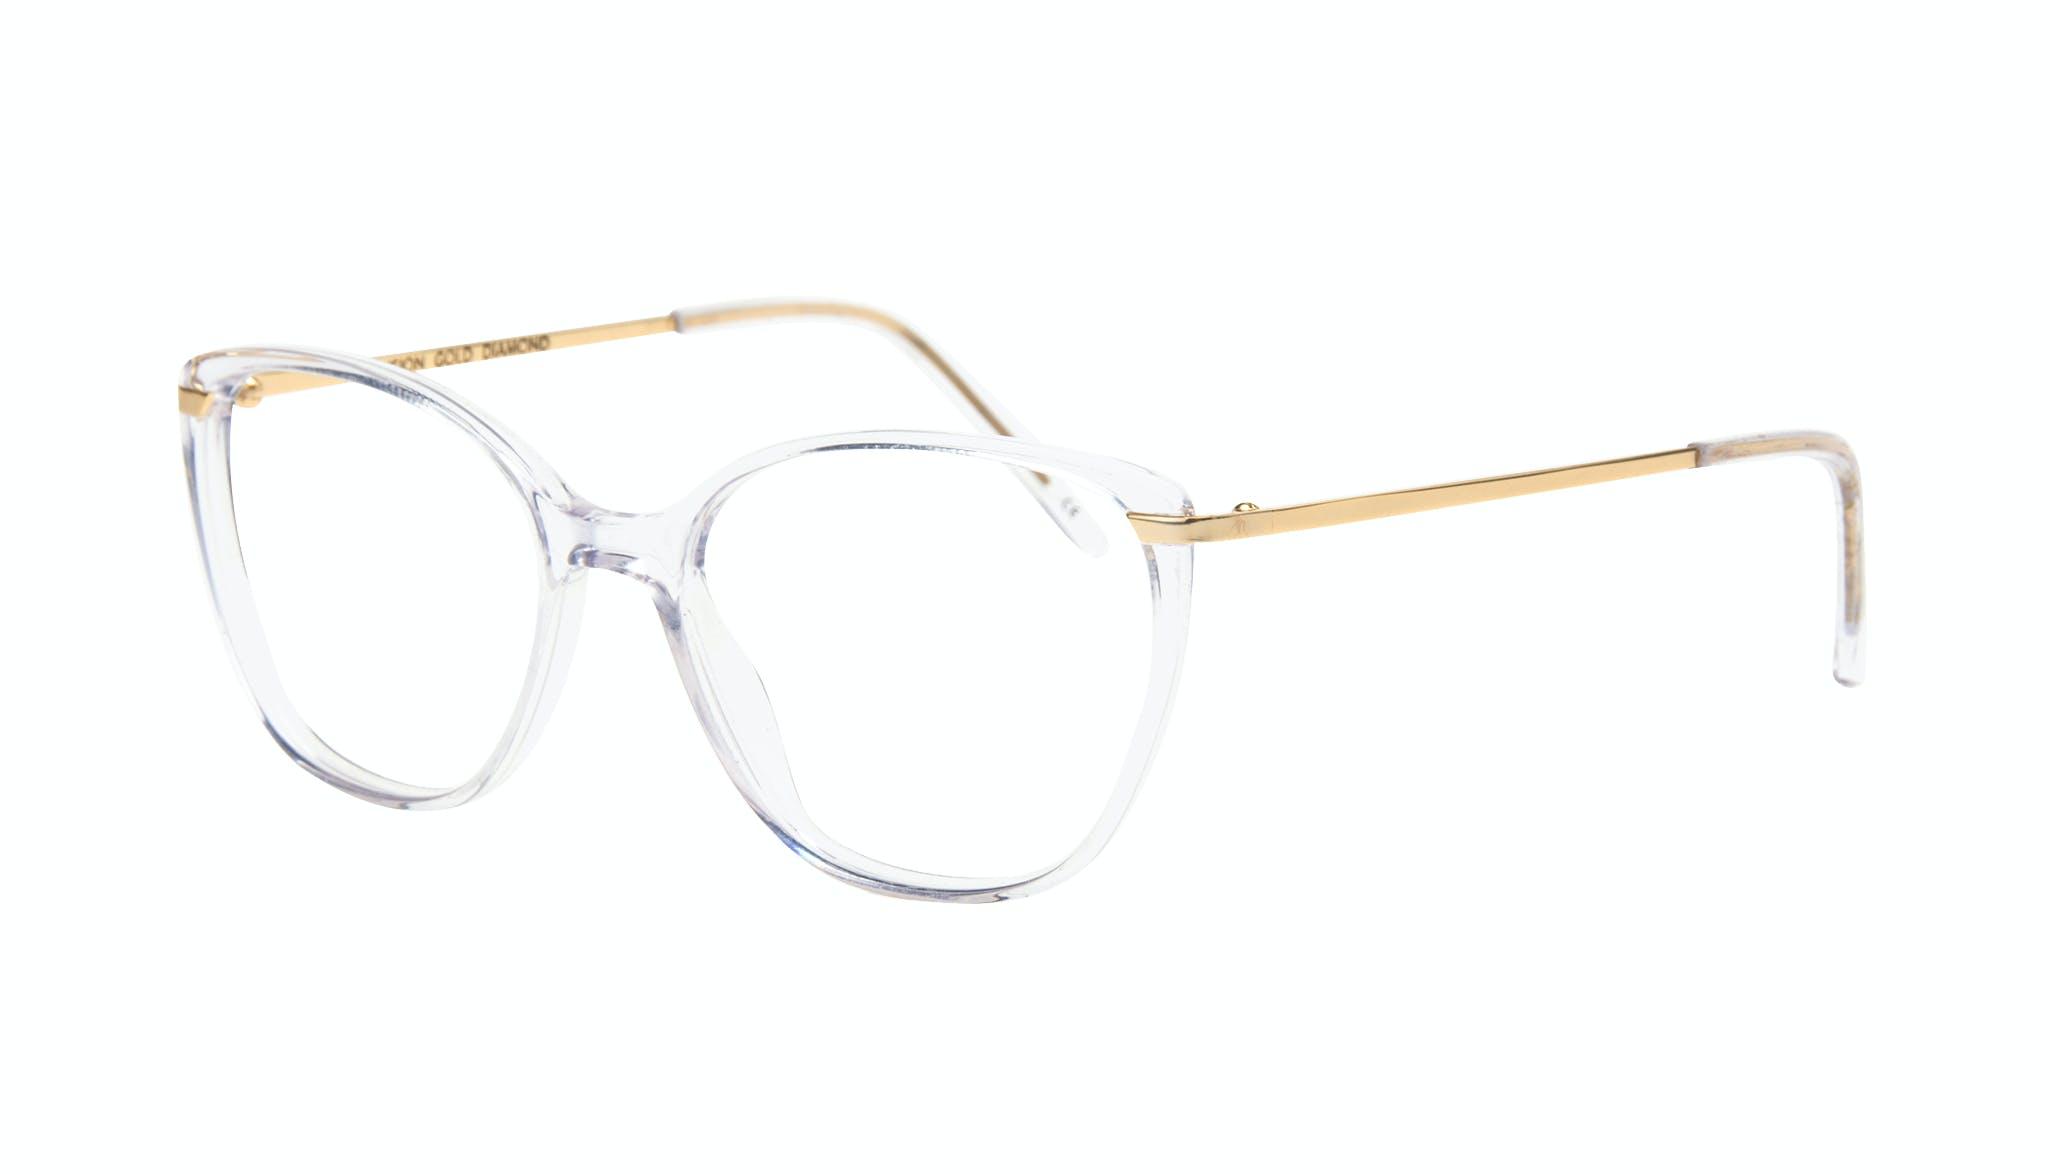 Affordable Fashion Glasses Cat Eye Rectangle Square Eyeglasses Women Illusion Gold Diamond Tilt